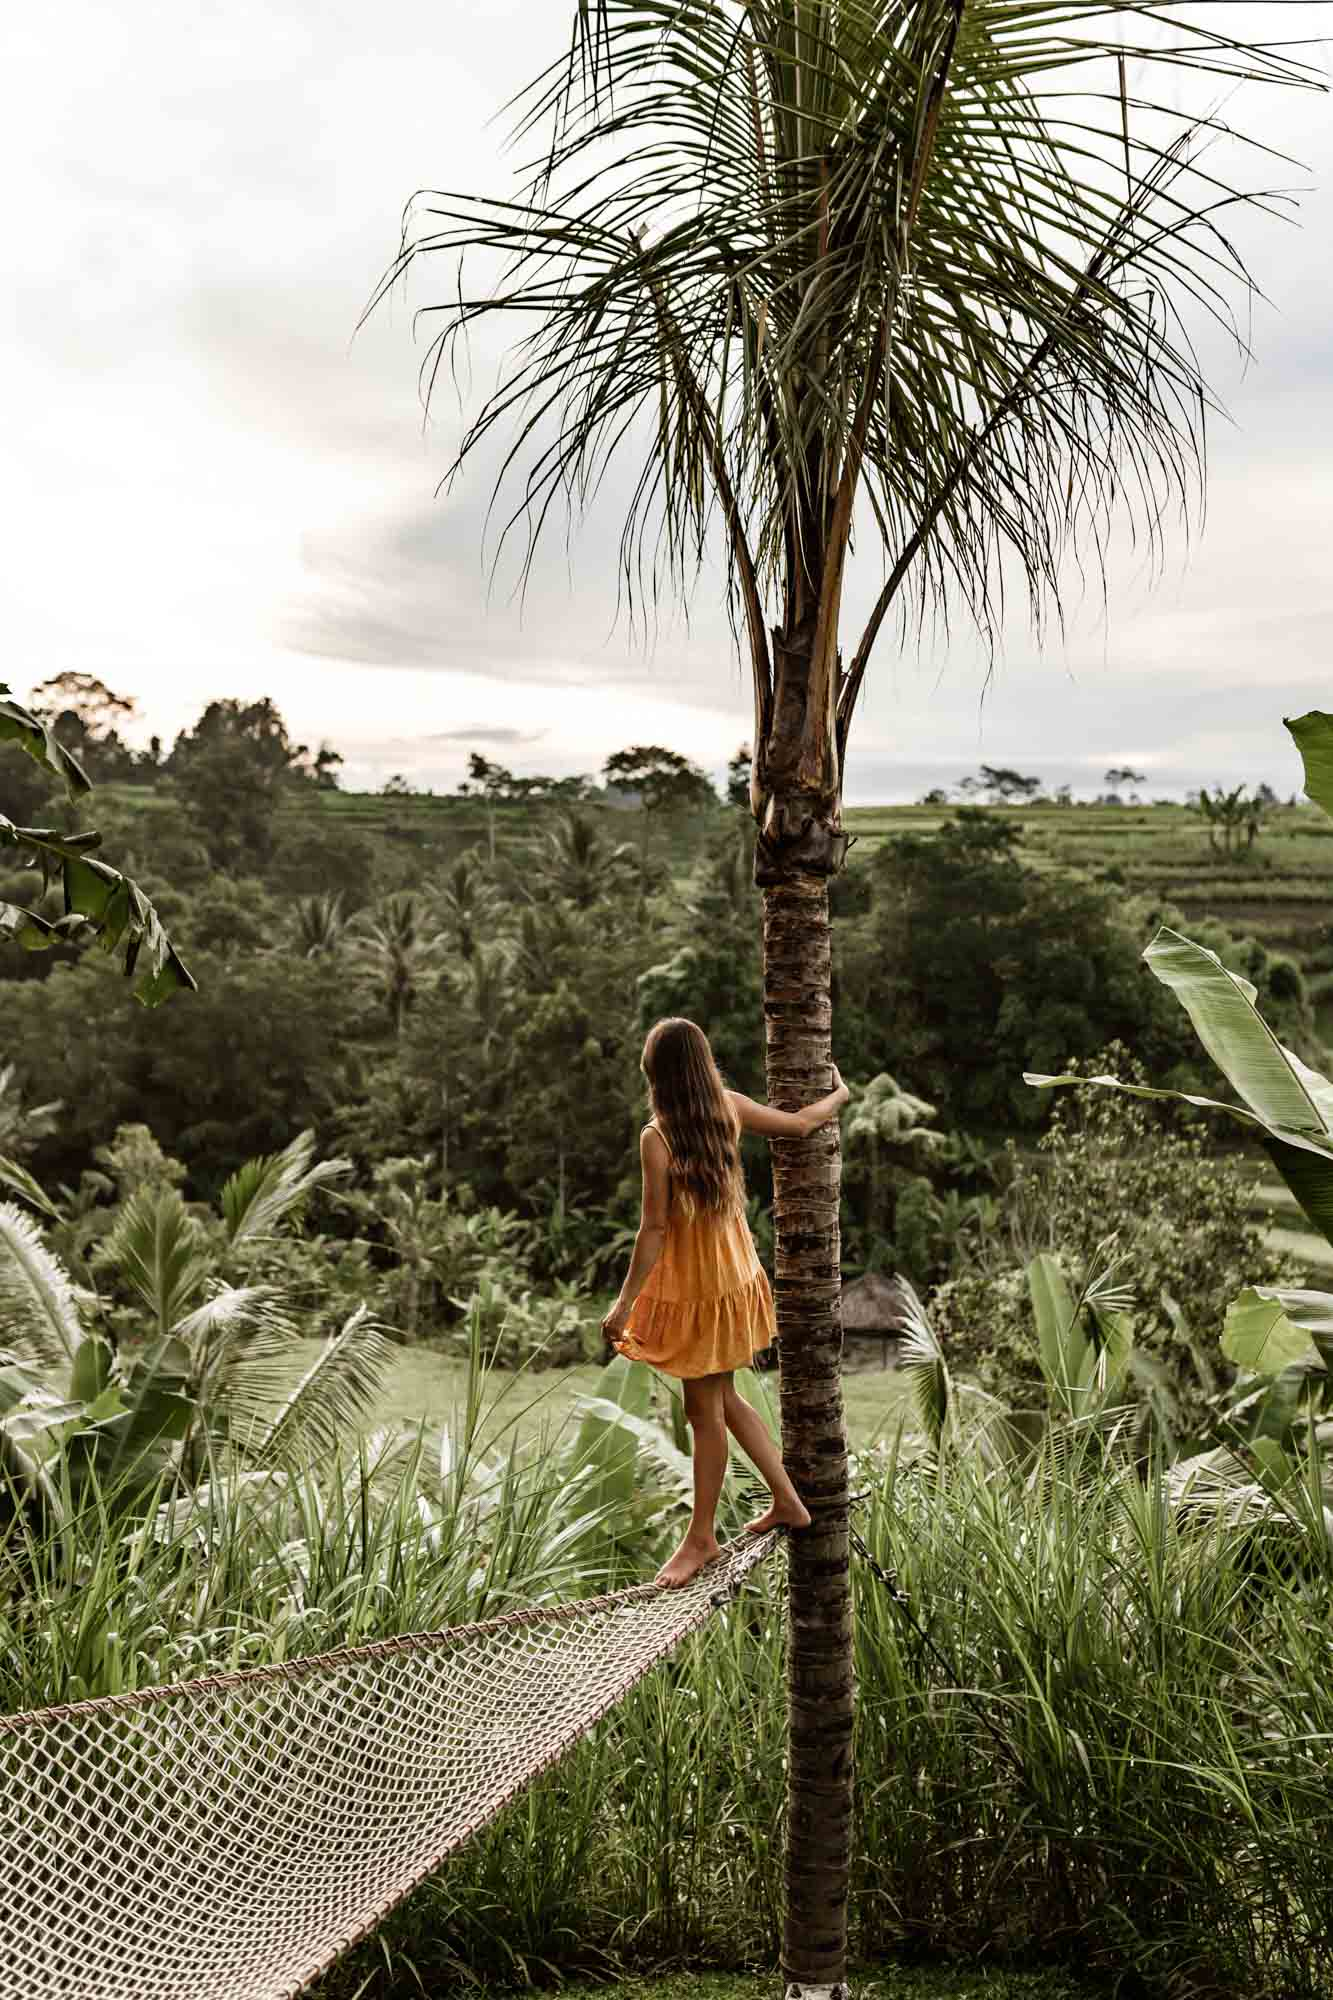 keira-mason-camaya-bali-rainforest-views-bali.jpg